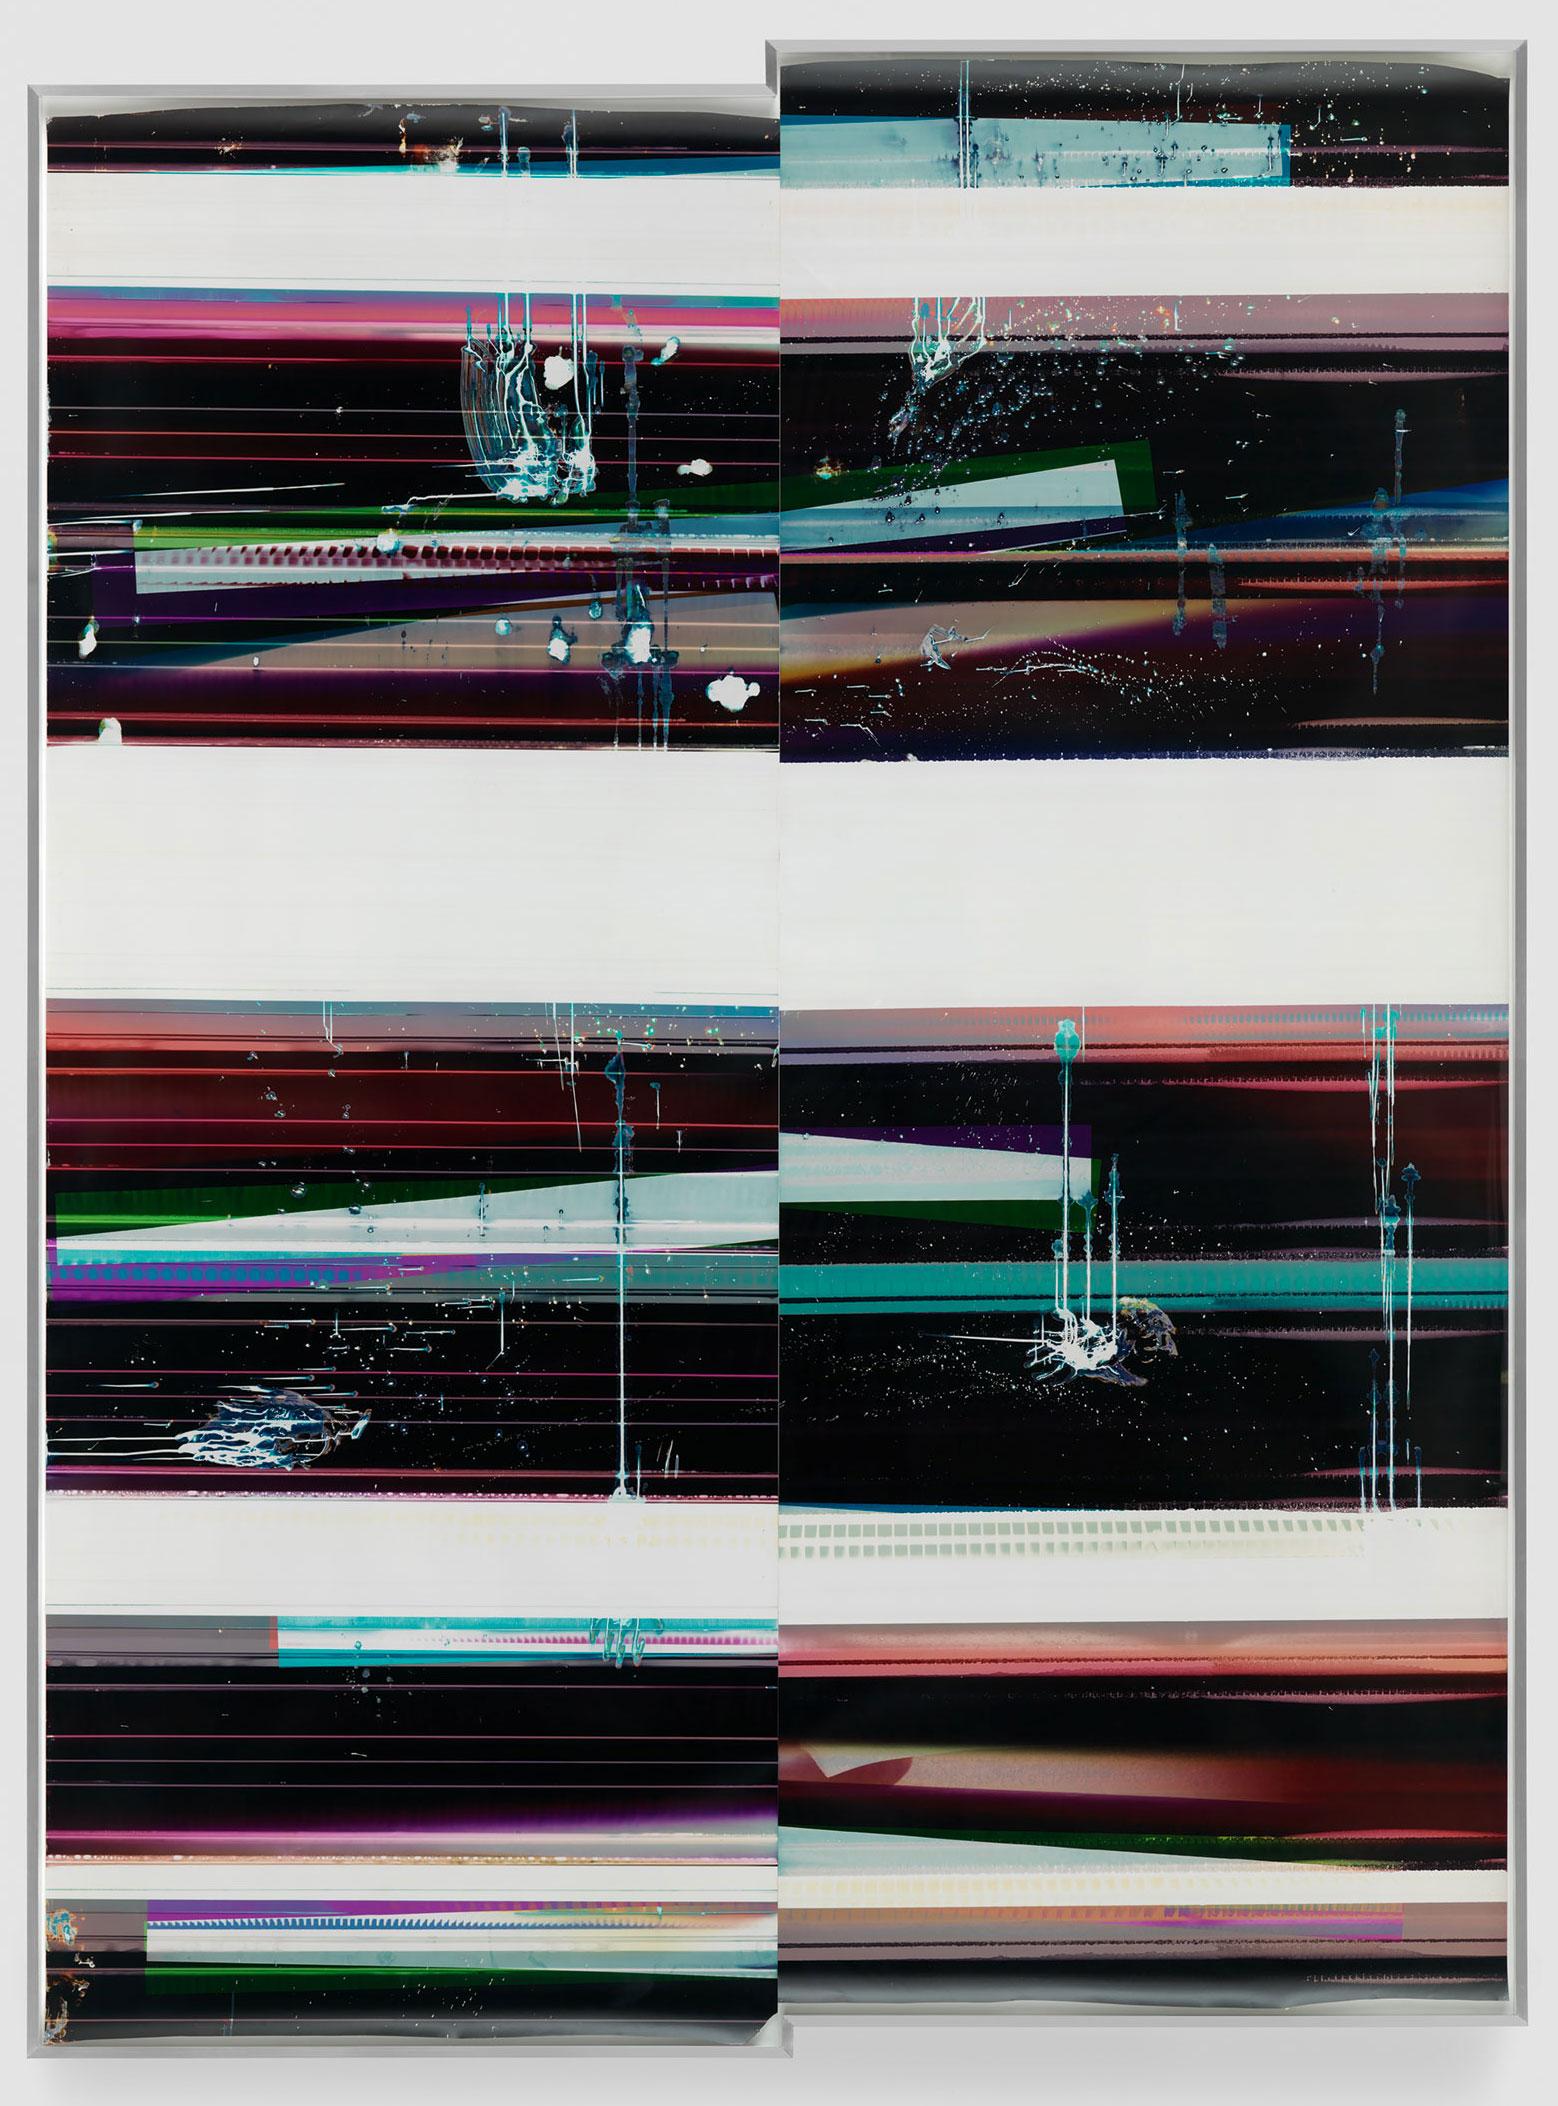 Cross-Contaminated RA4 Contact Print / Processor Stall / Depleted Developer [Black Curl (MYC/Six Magnet/Six Magnet: Los Angeles, California, April 7, 2016,Fujicolor Crystal Archive Super Type C, Em. No. 112-006, Kodak Ektacolor RA Bleach-Fix and Replenisher, 06716), Kreonite KM IV 5225 RA4 Color Processor, Ser. No. 00092174]    2016   Color photographic paper  134 x 100 inches   Automat, 2016